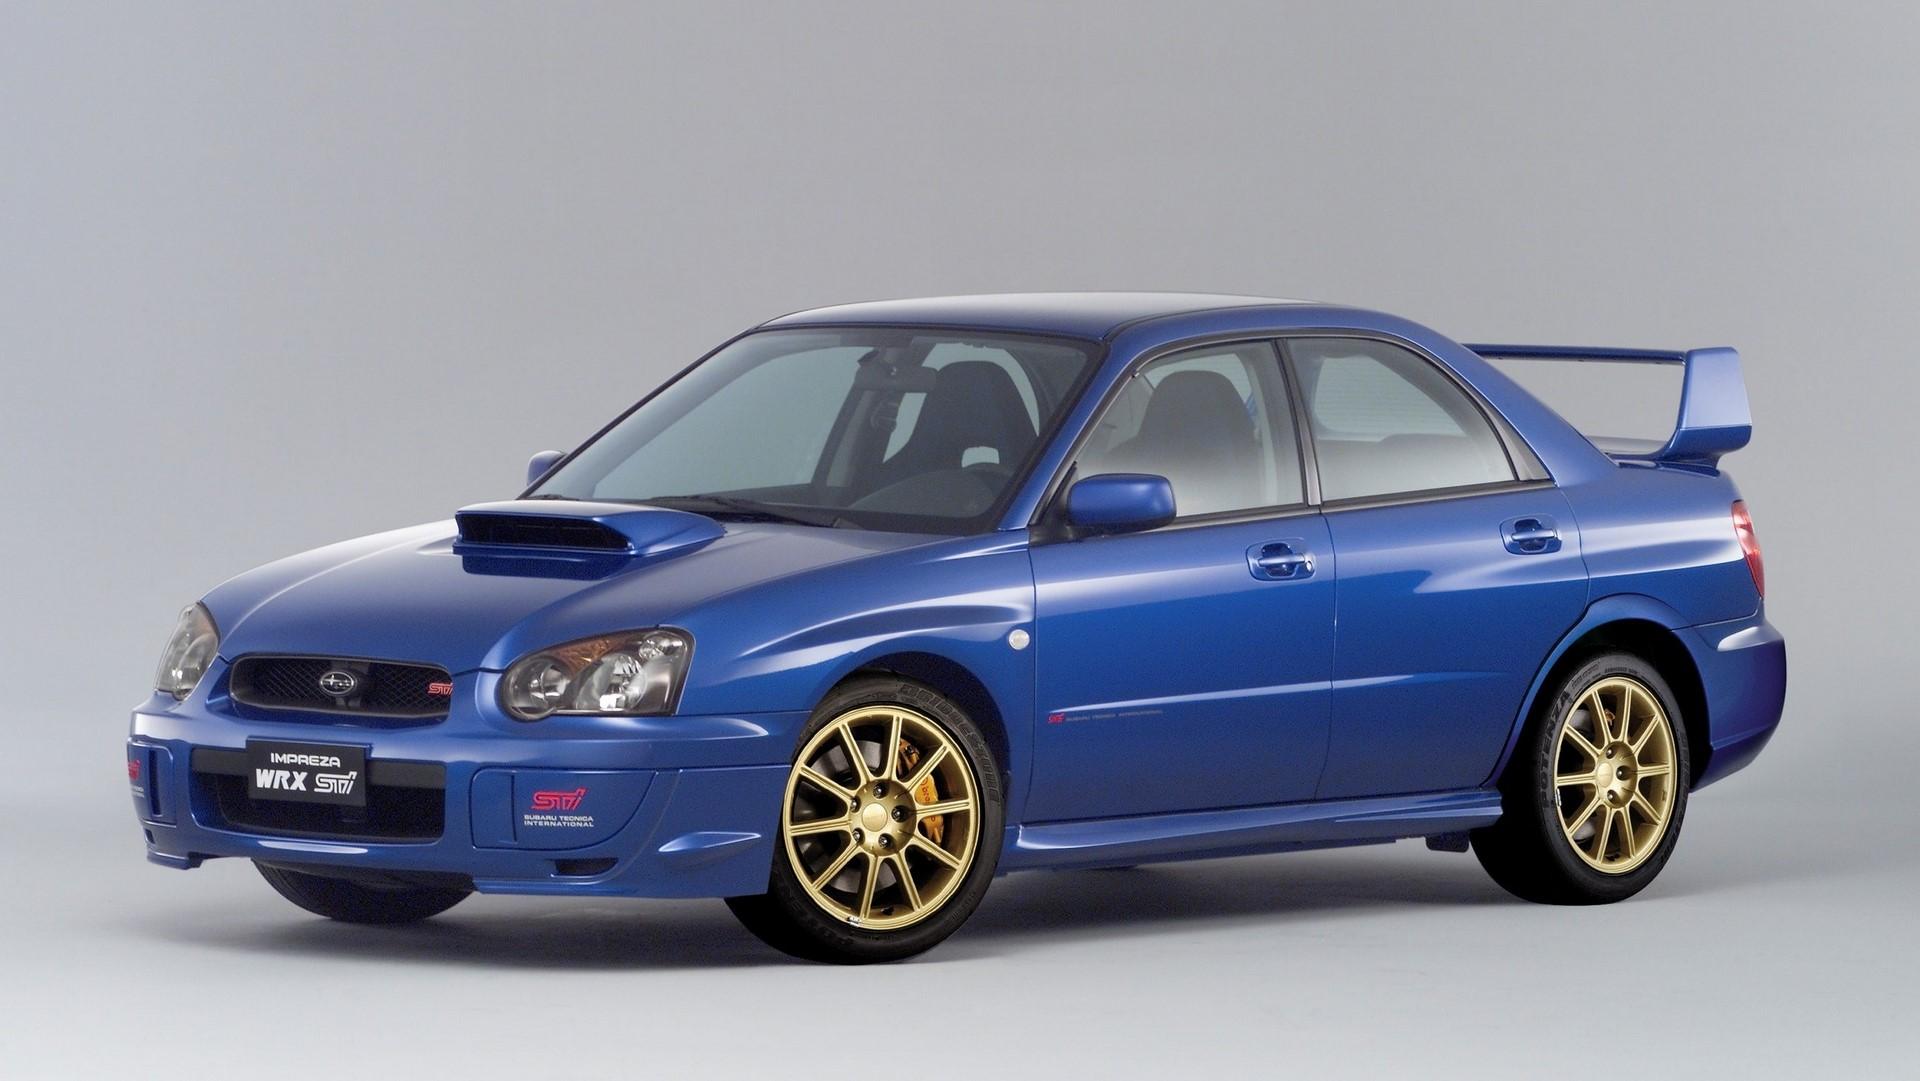 2004-wrx-sti-3-2